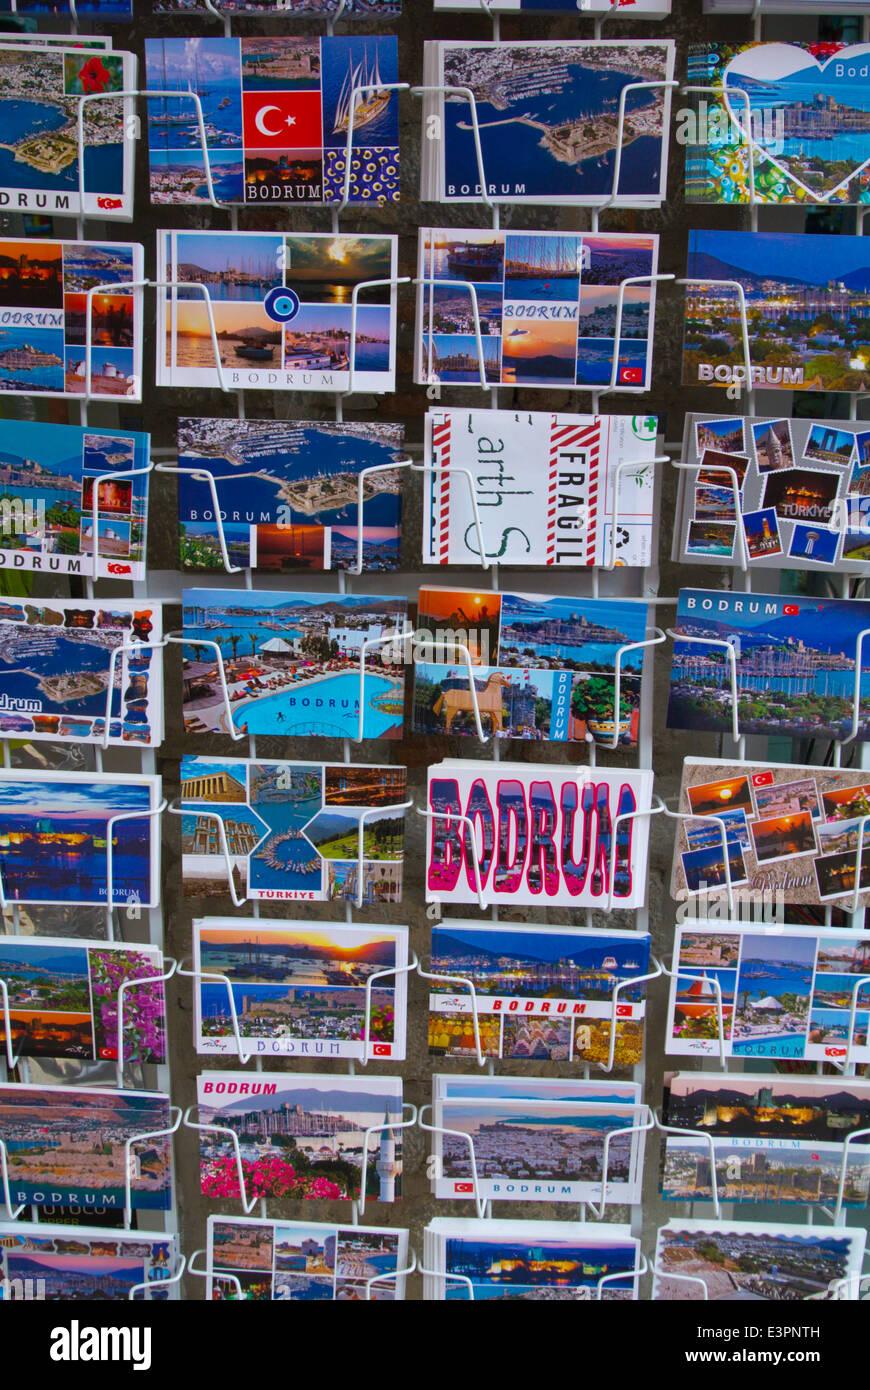 Postcards, Bazaar area, Bodrum, Turkey, Asia Minor - Stock Image